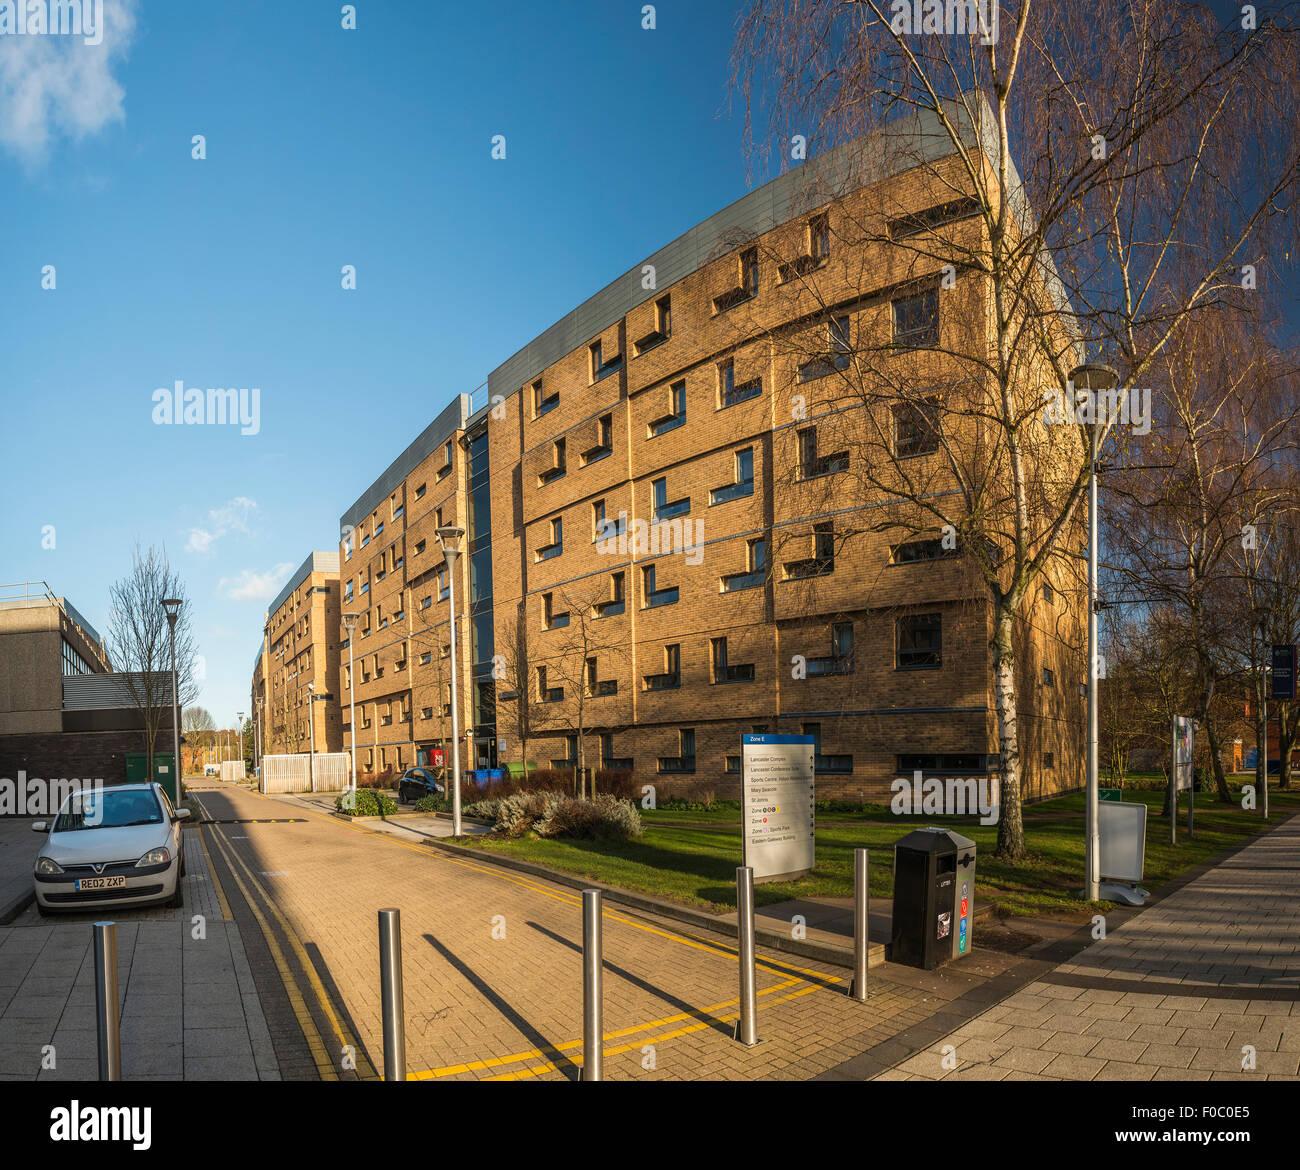 Brunel University campus building in Uxbridge, London, UK - Stock Image